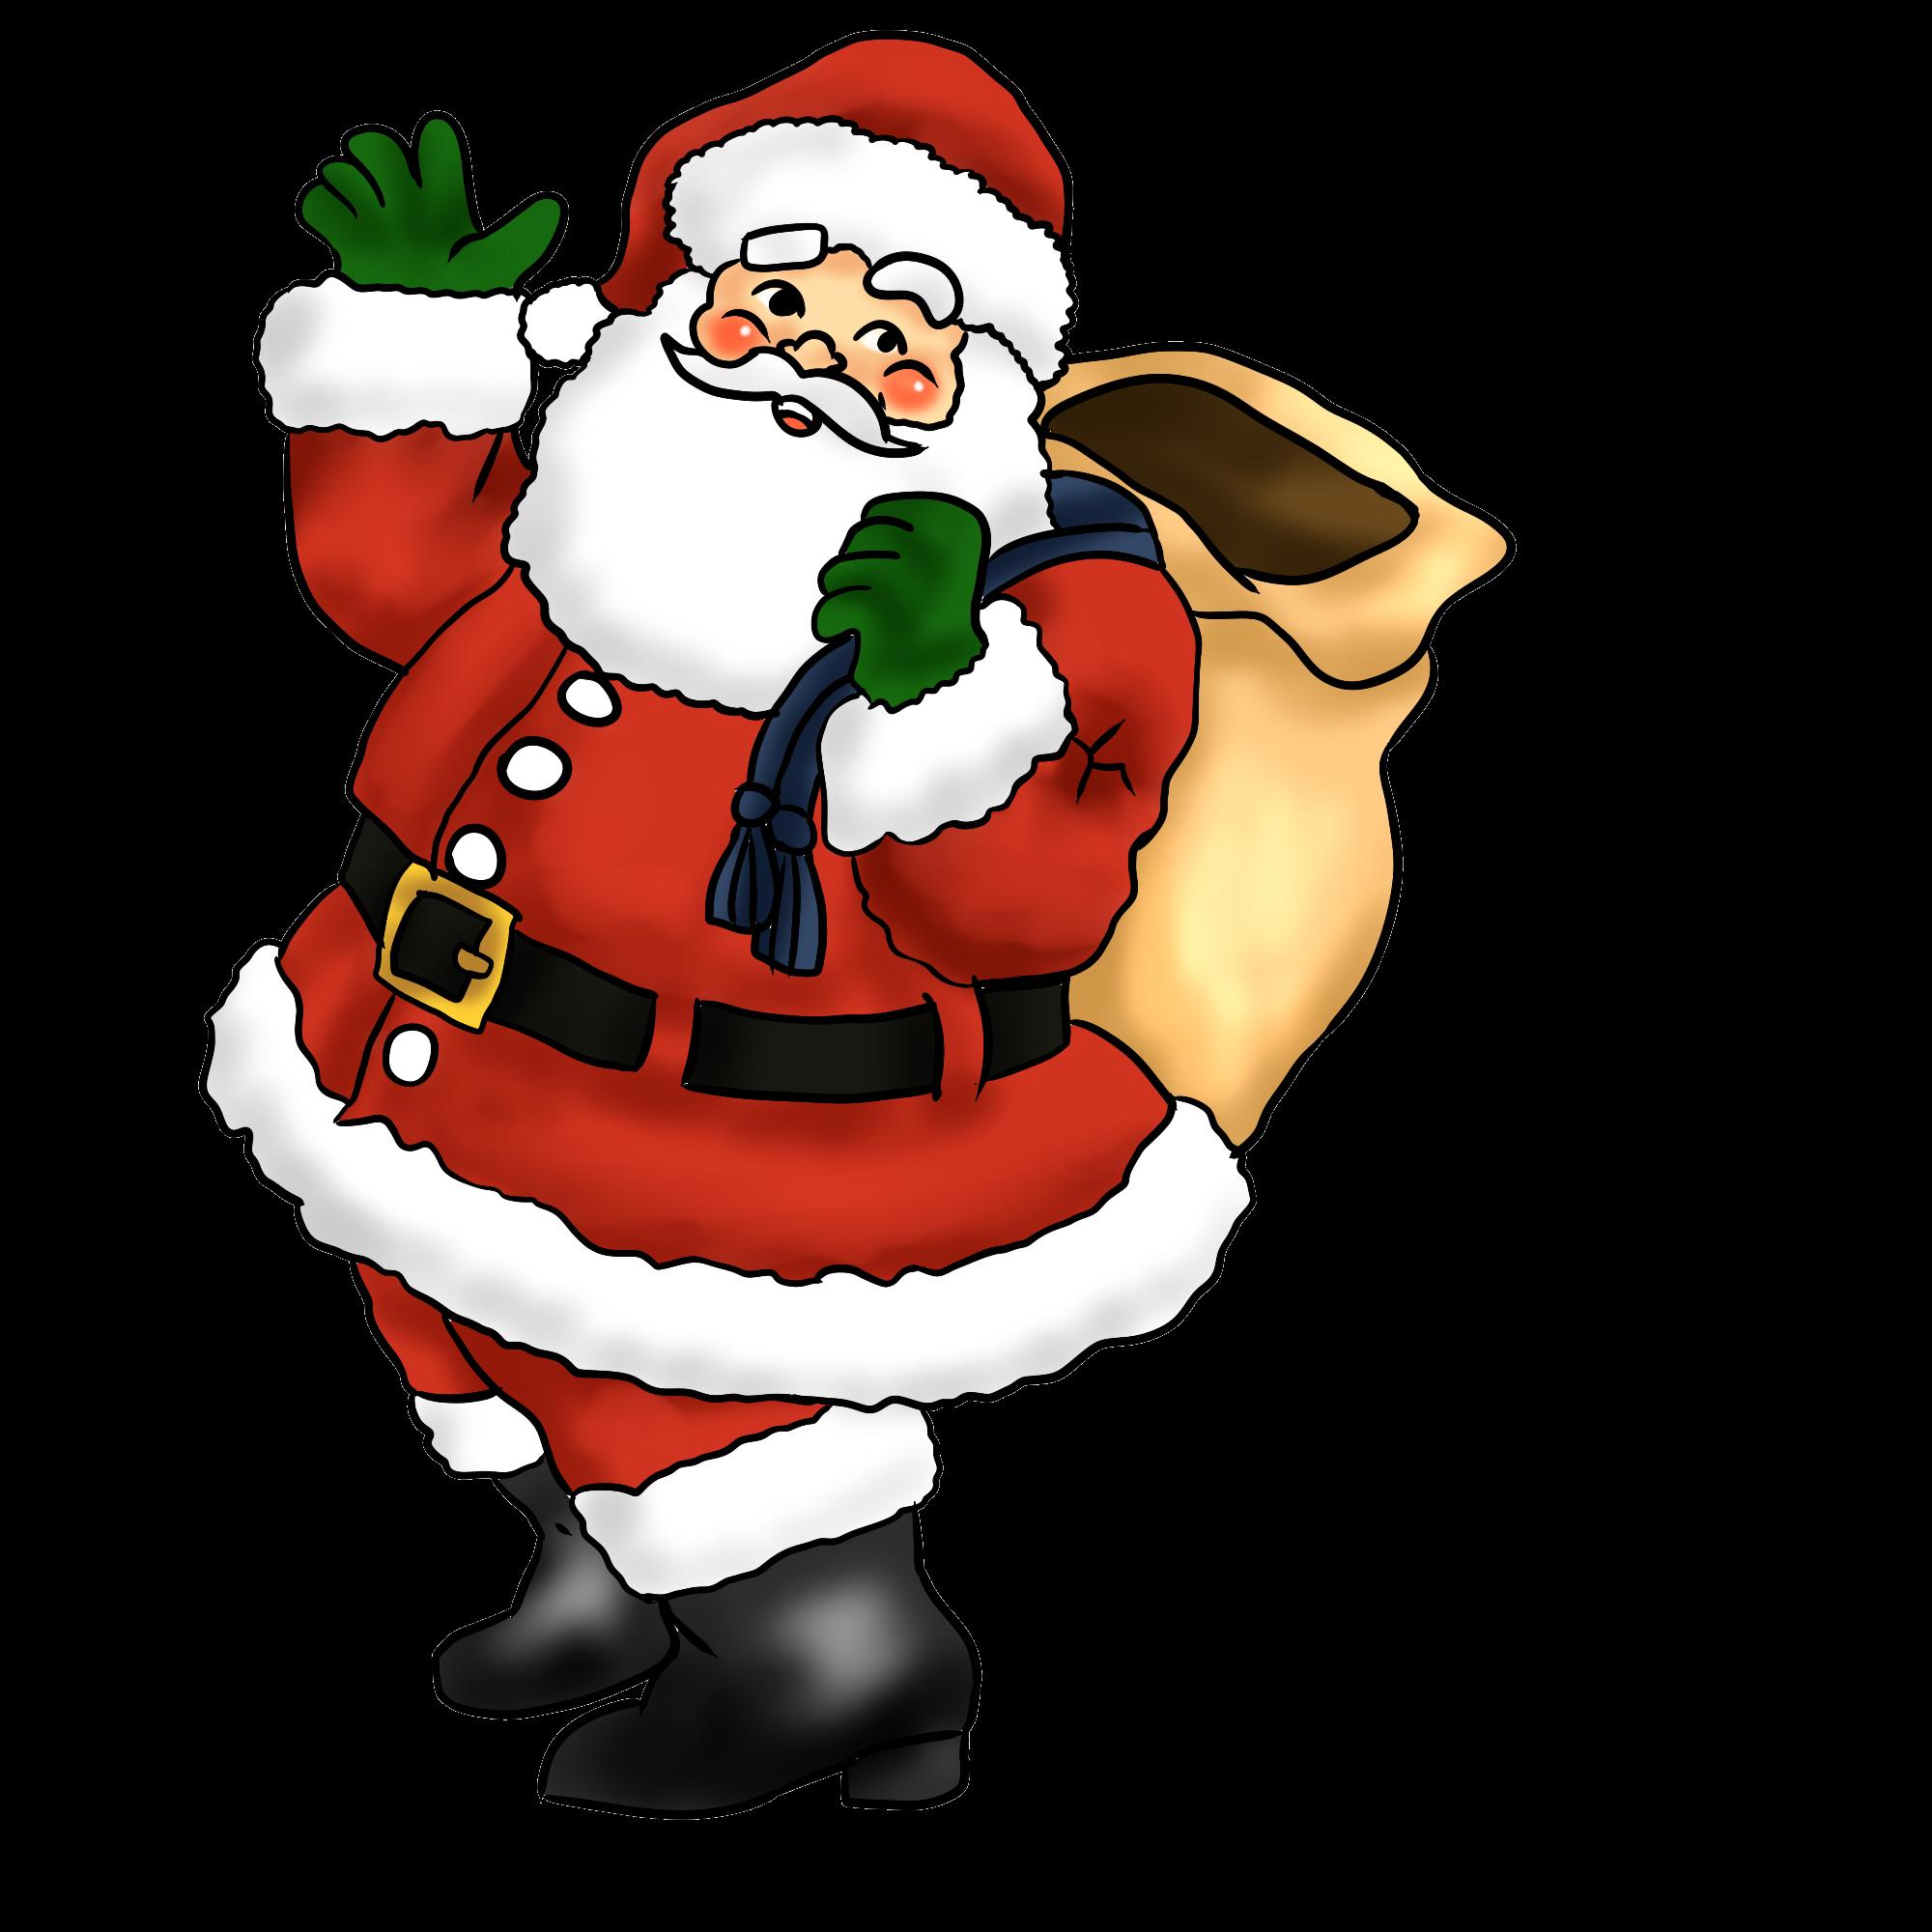 Free Lovely Santa Claus Clip Art